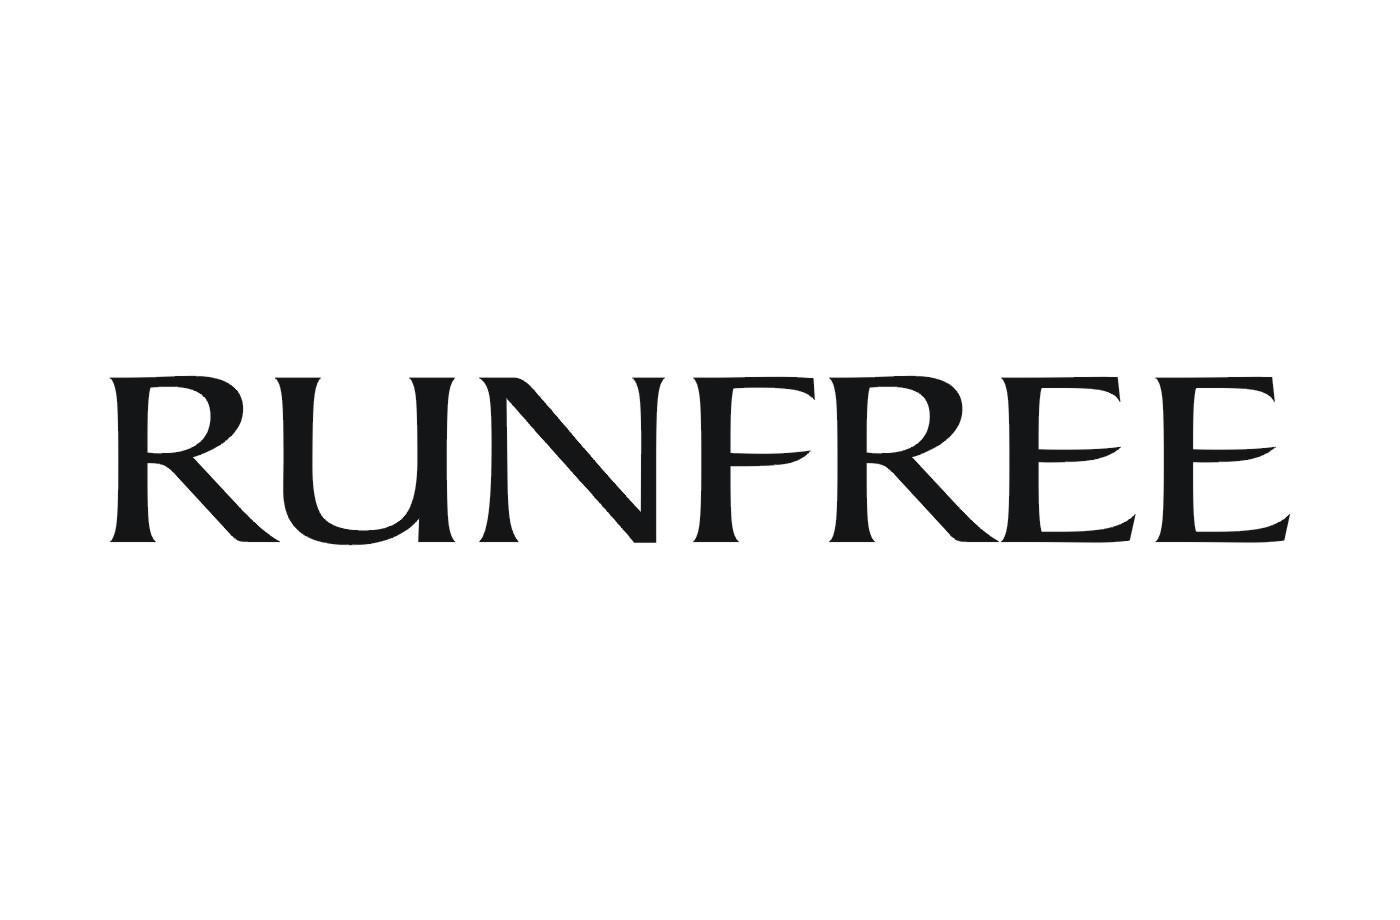 RUNFREE